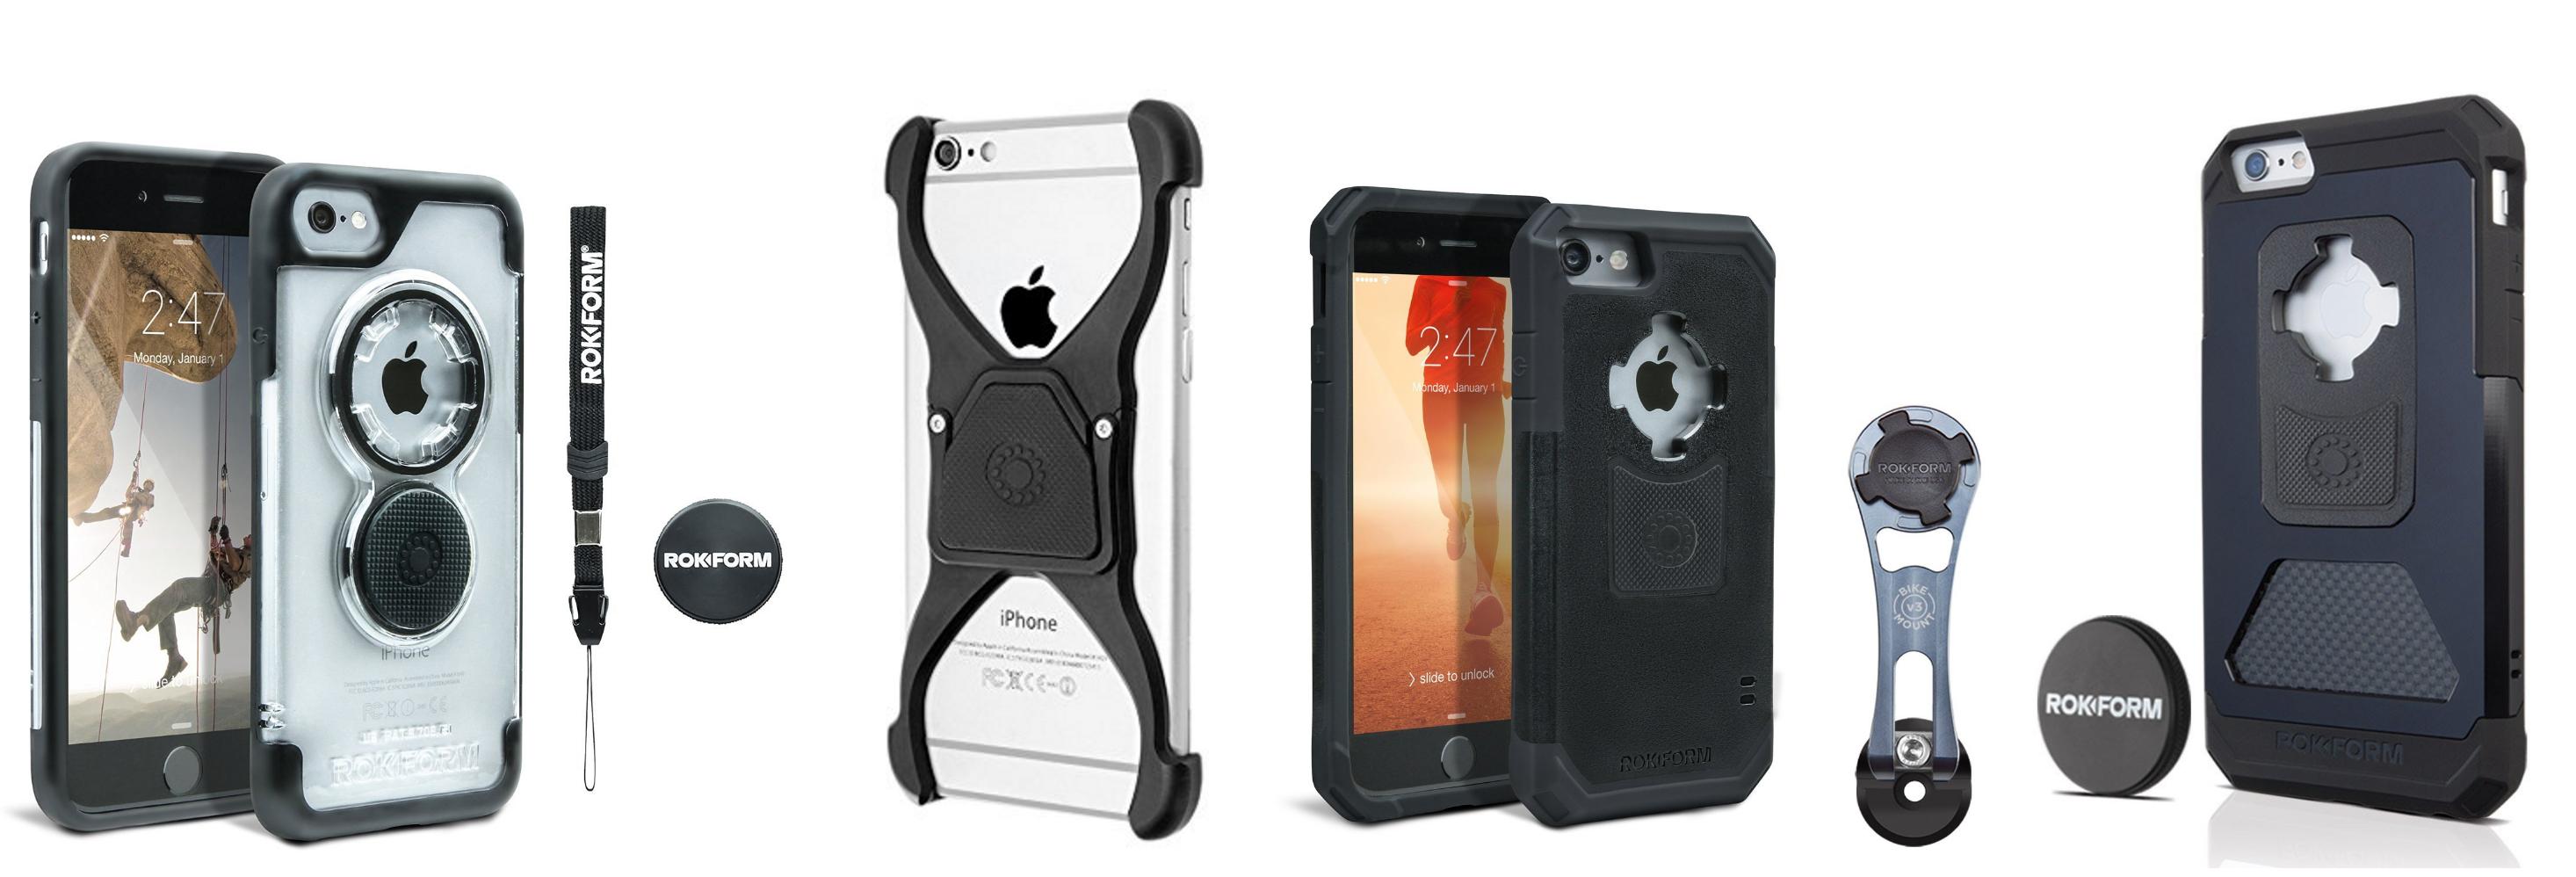 rokform-iphone-7-cases